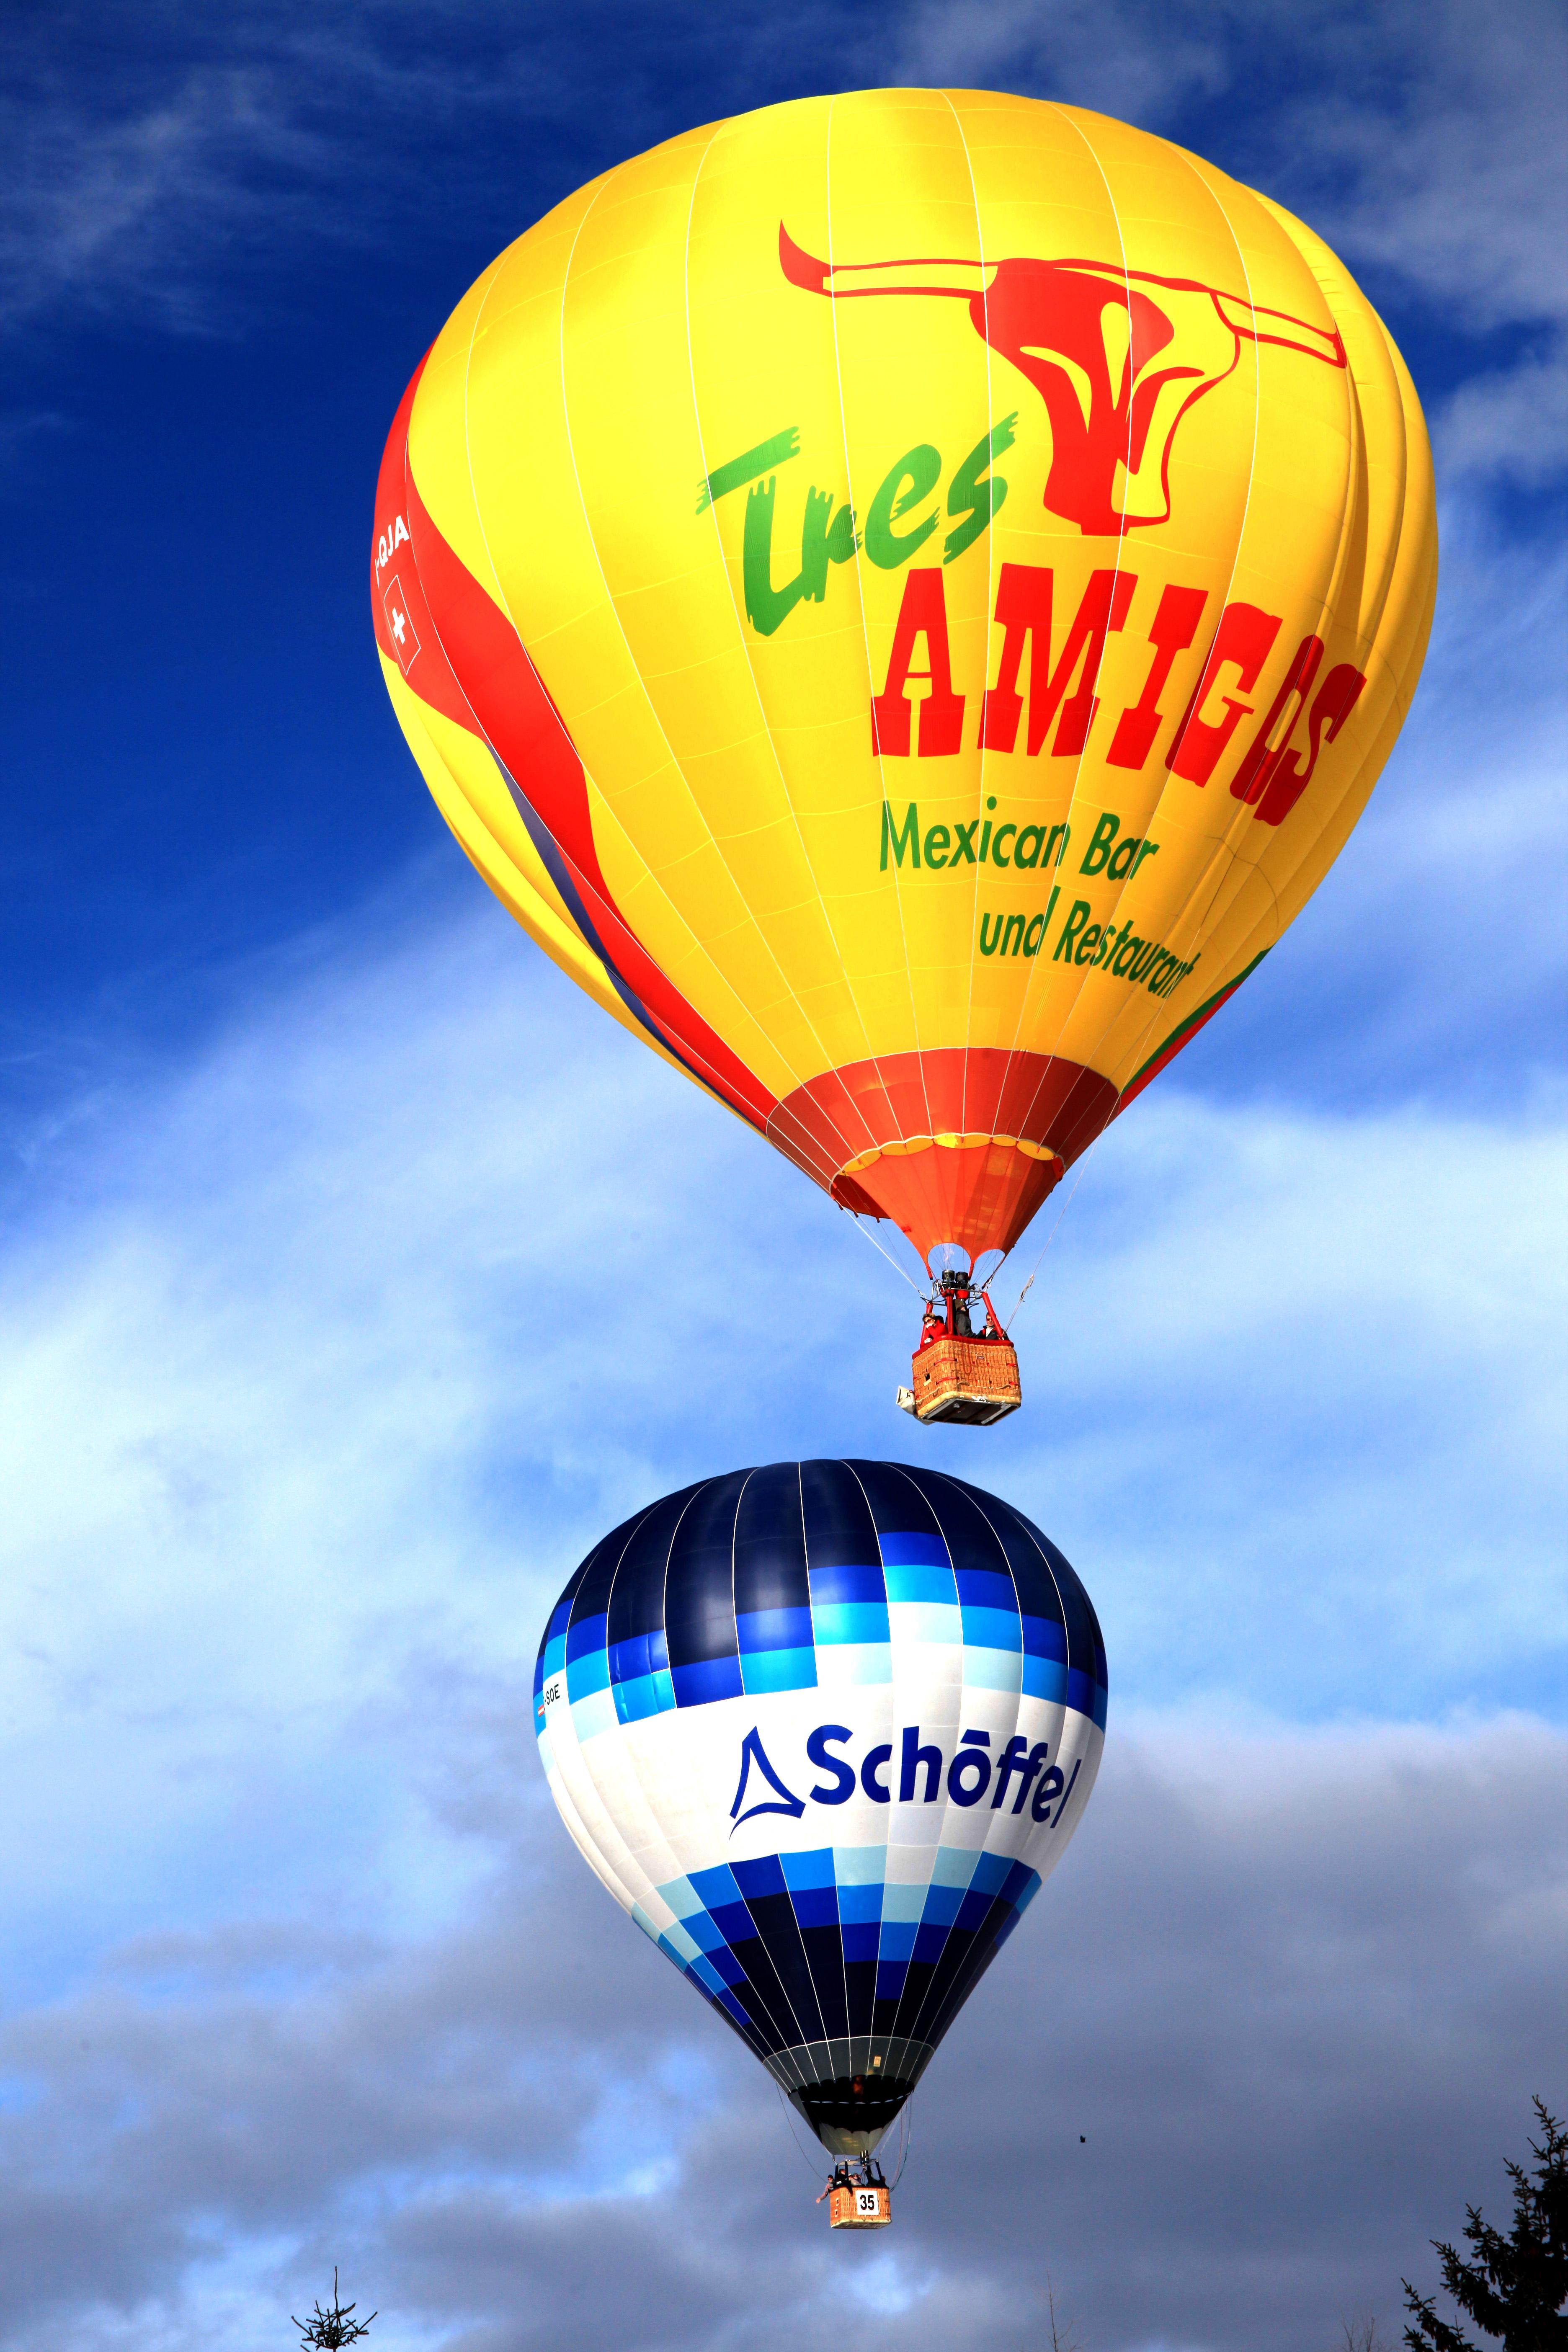 Rappiballon_thedi_bolli_heissluftballon_ballonfahren_Rapperswil_ballonangebo_gallerie11.